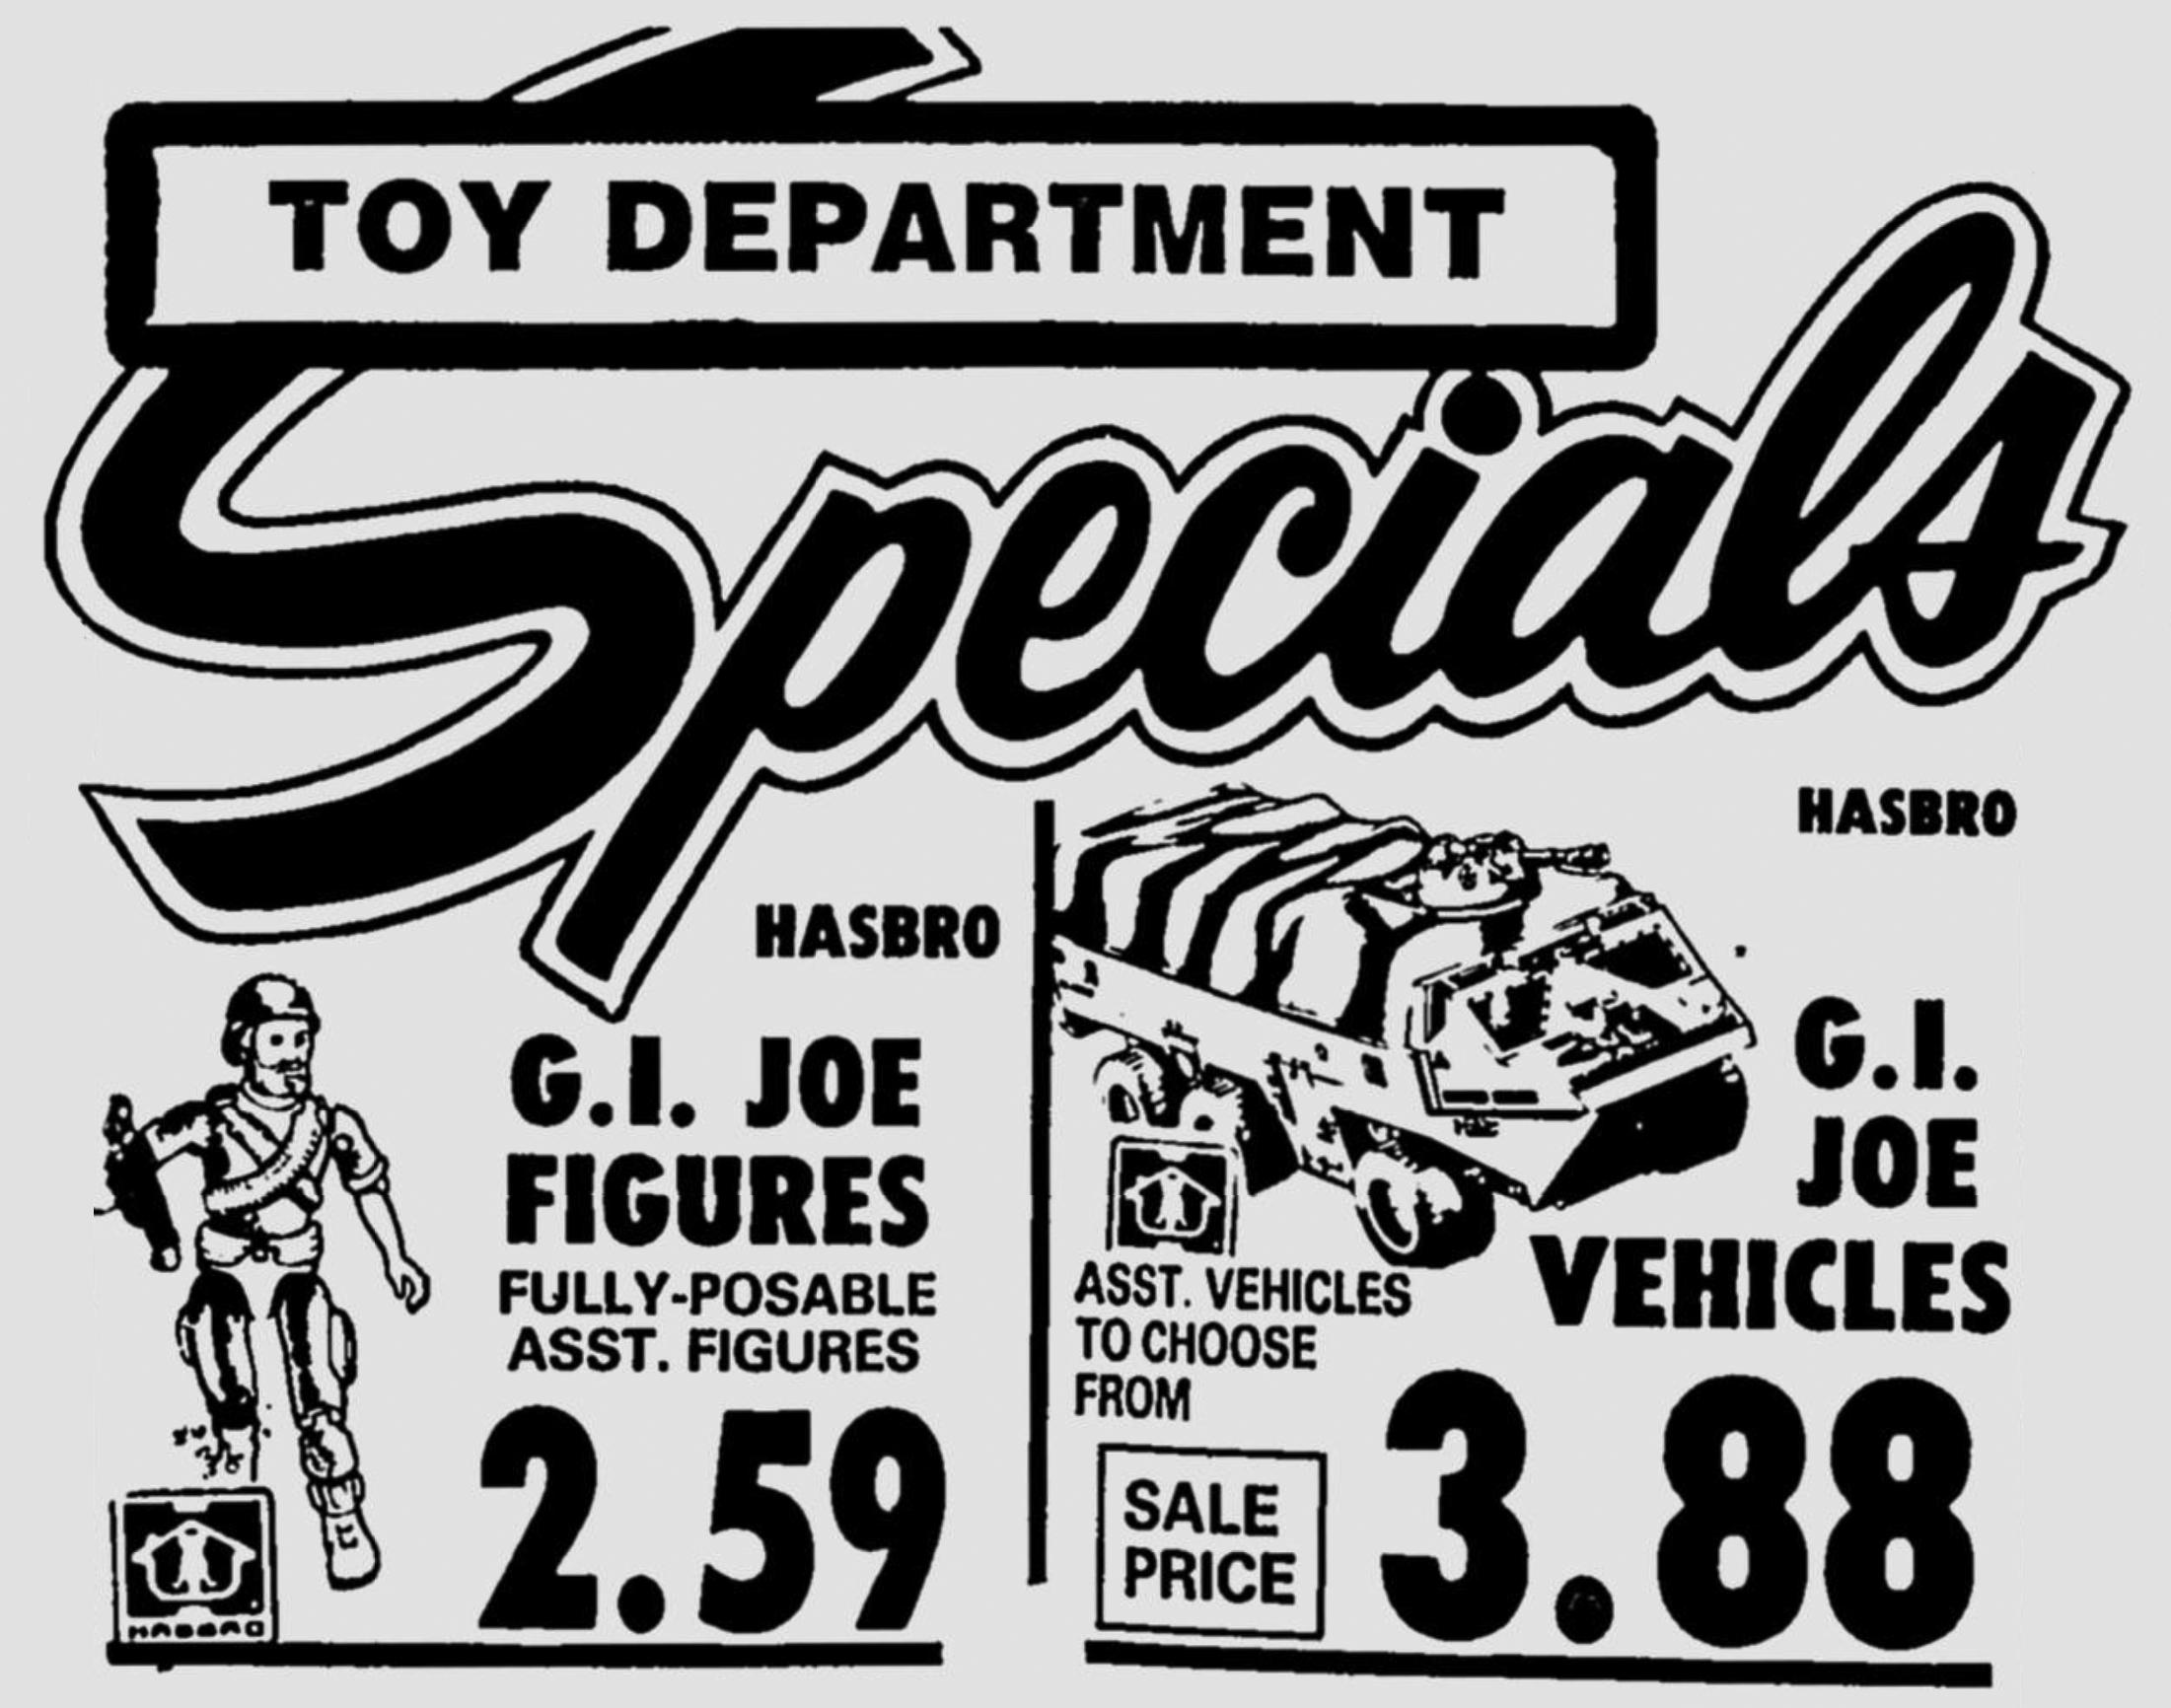 Hasbro G.I. Joe Figures and Vehicles on Sale in 1983